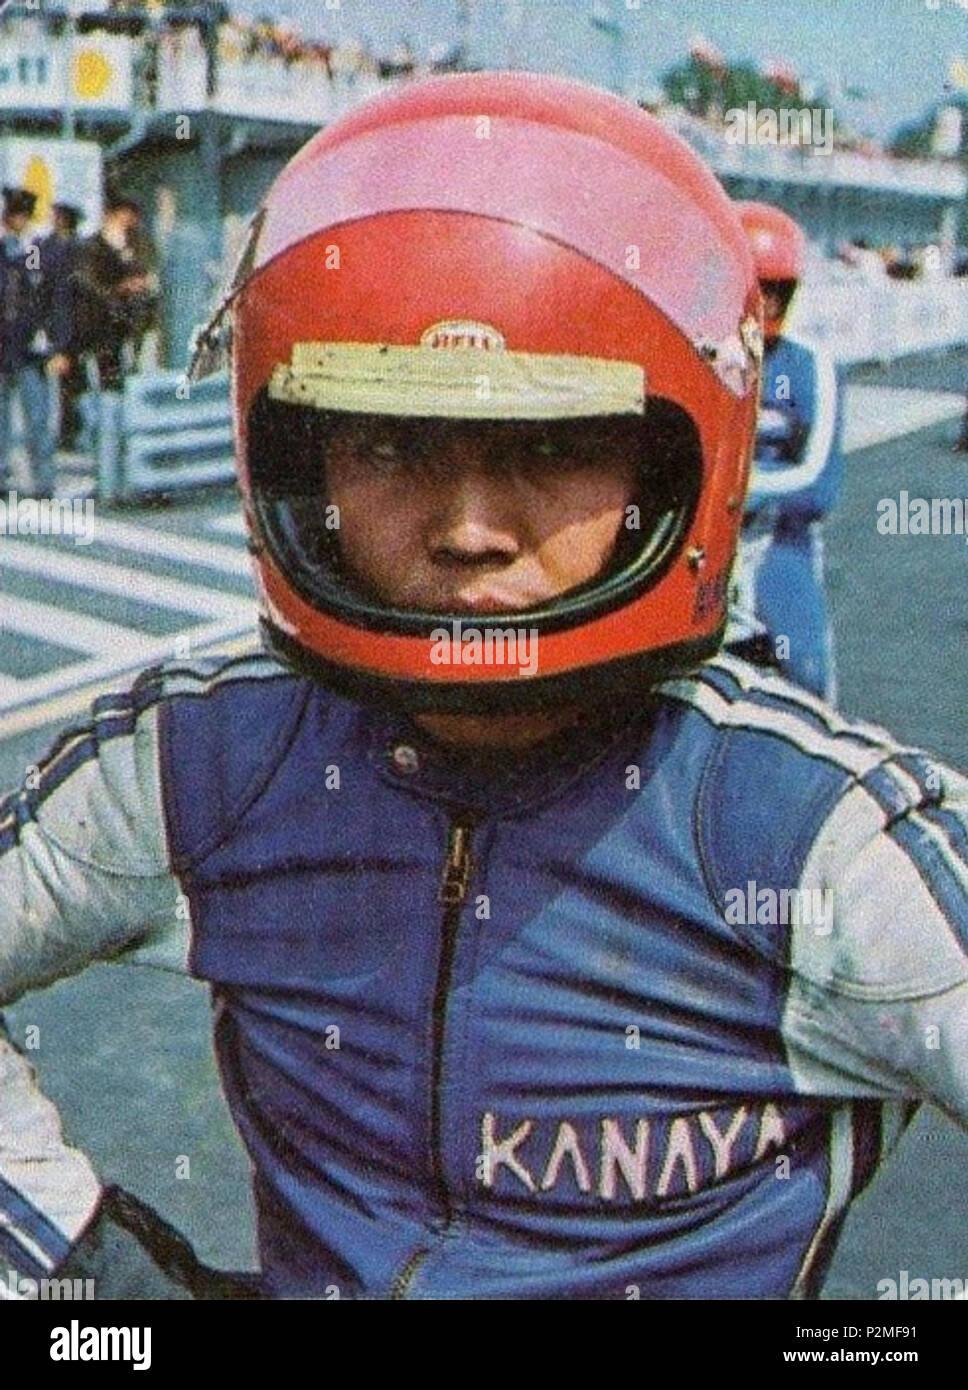 . CAMPIONI dello SPORT 1973/74-Figurina n.211- KANAYA - GIAPPONE -MOTOCICLISMO-Rec . 1973 or earlier. Unknown 39 Hideo Kanaya c1973 Stock Photo